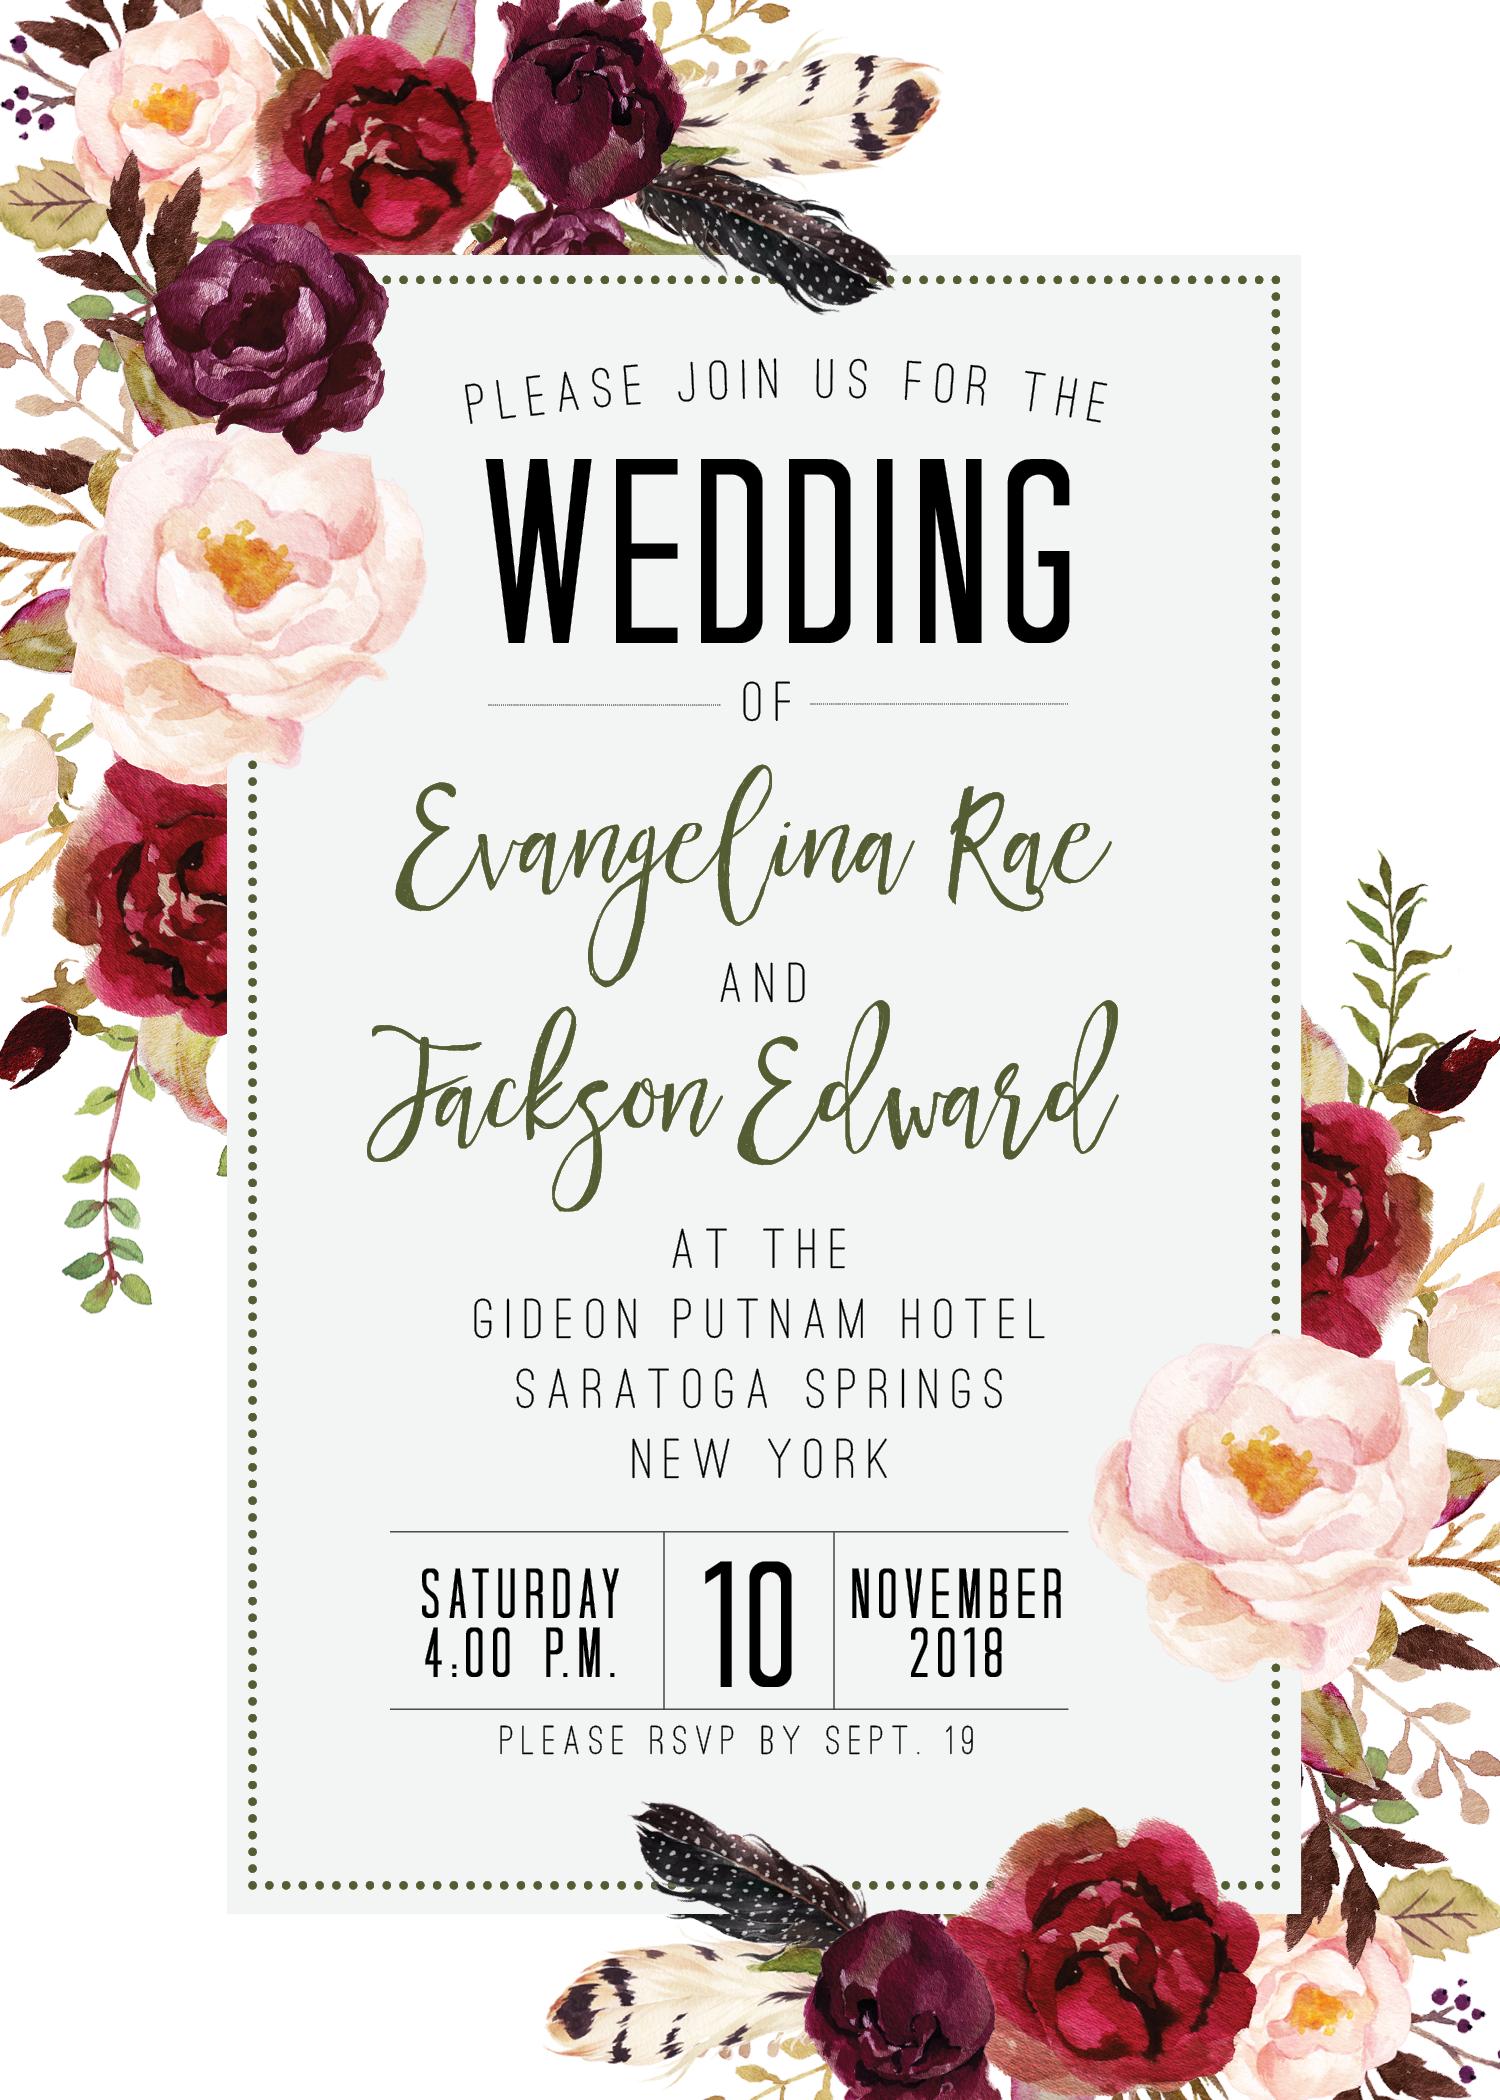 Vintage wedding decorations ideas november 2018 boho wedding gold foil wedding invitations wedding invitations